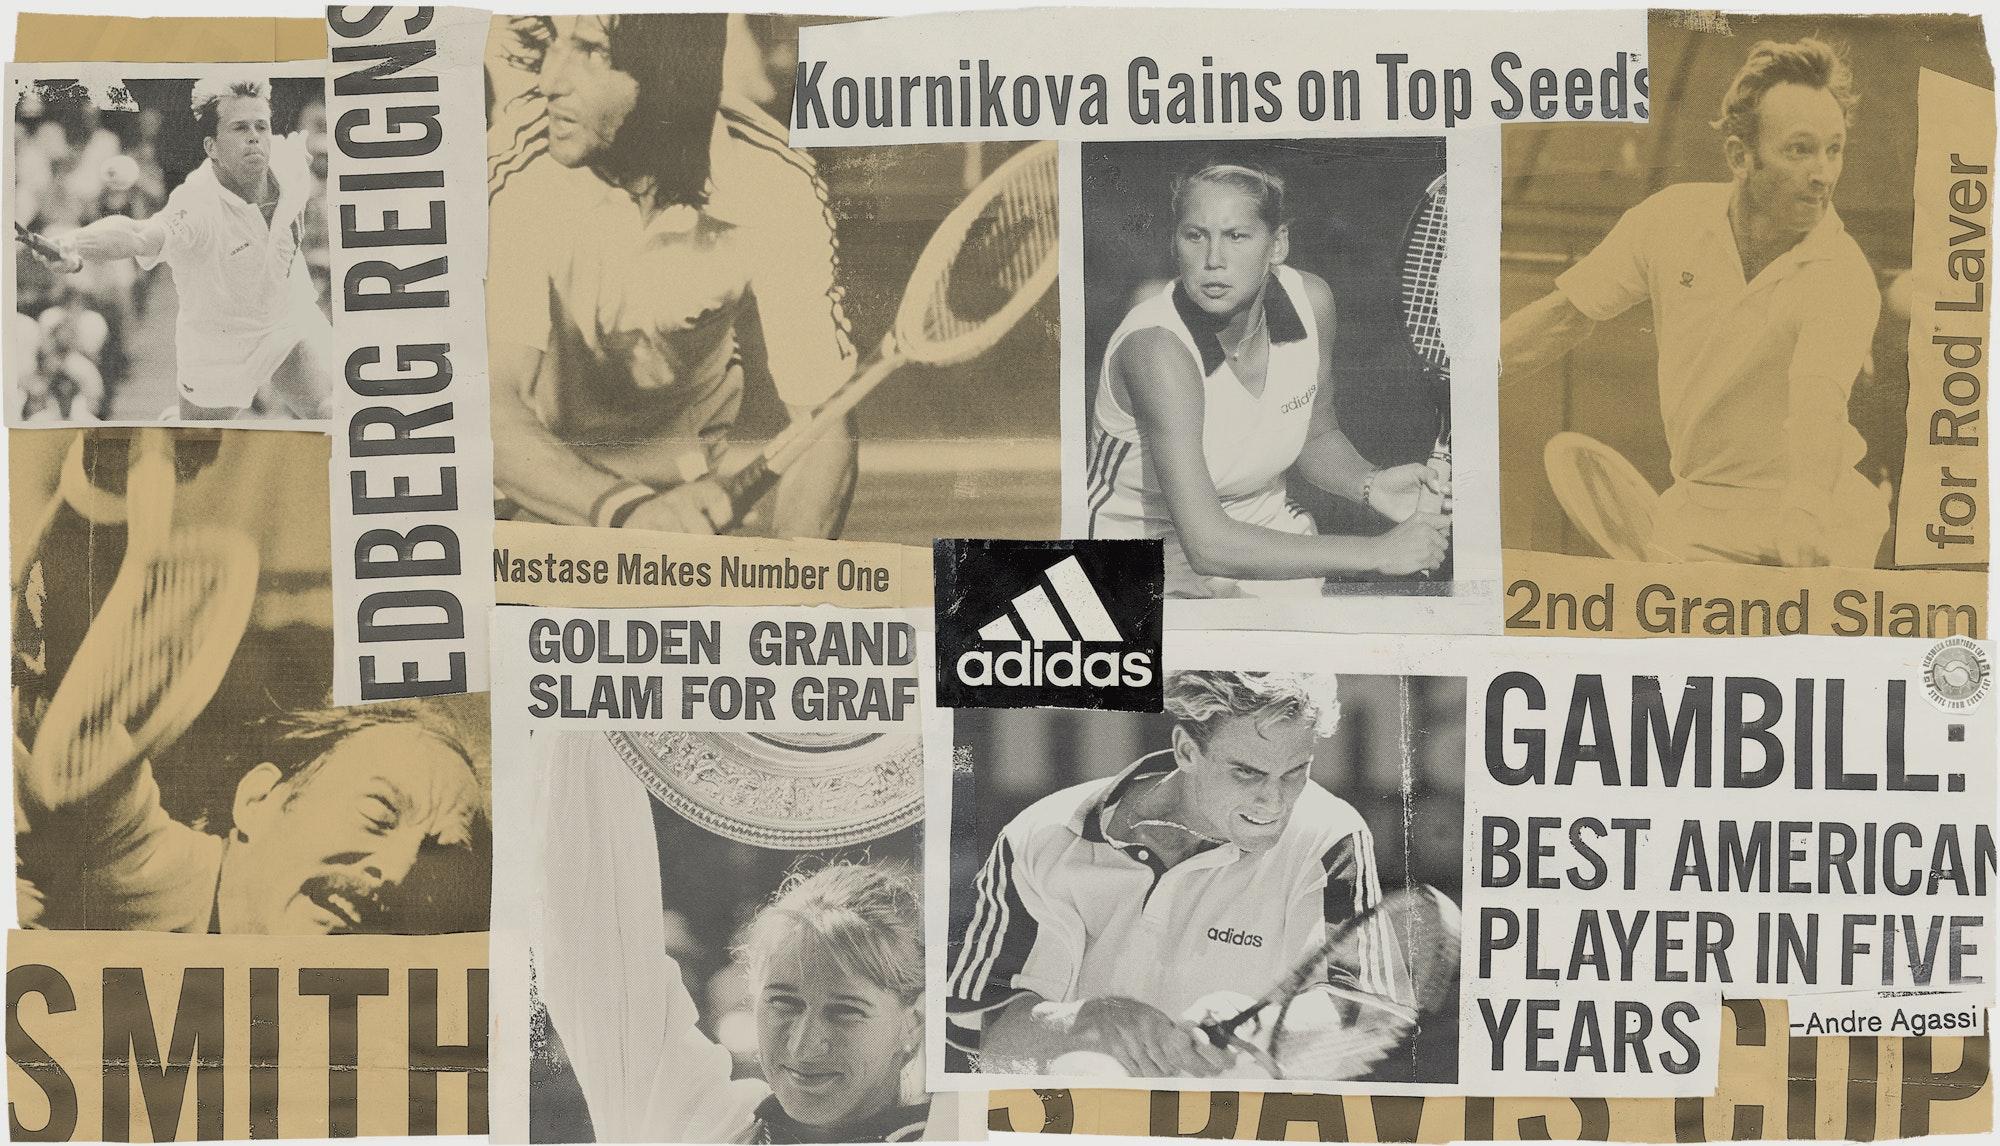 JEFF DOOLEY CREATIVE - adidas-tennis